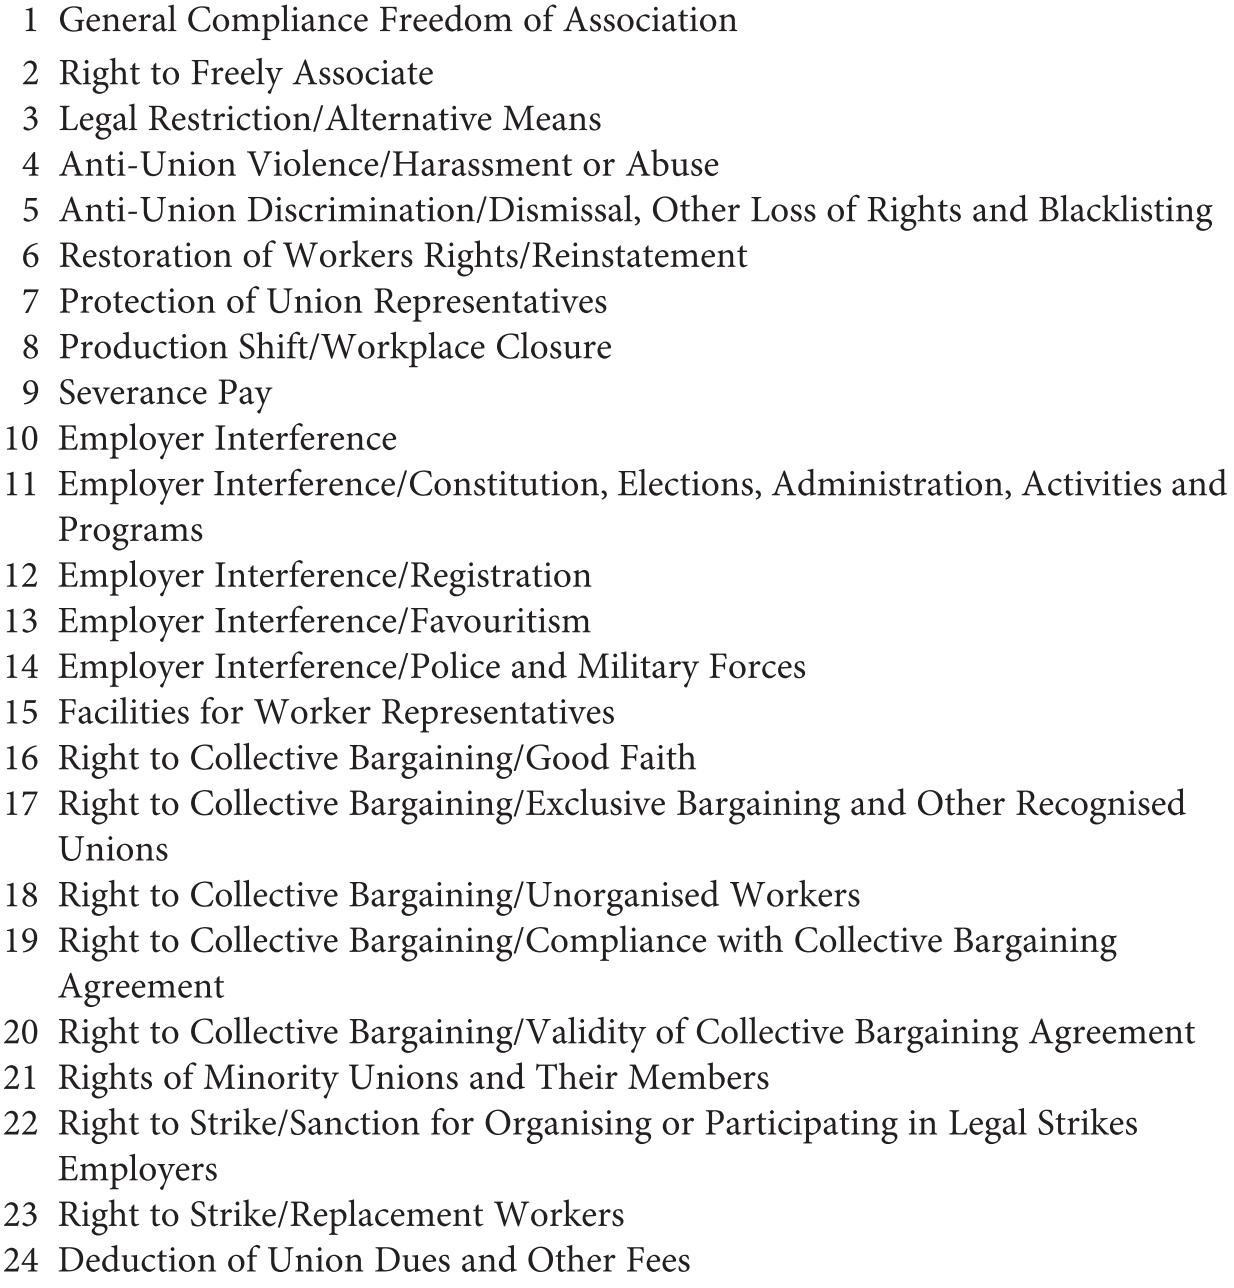 Implementation and Enforcement (Part IV) - Global